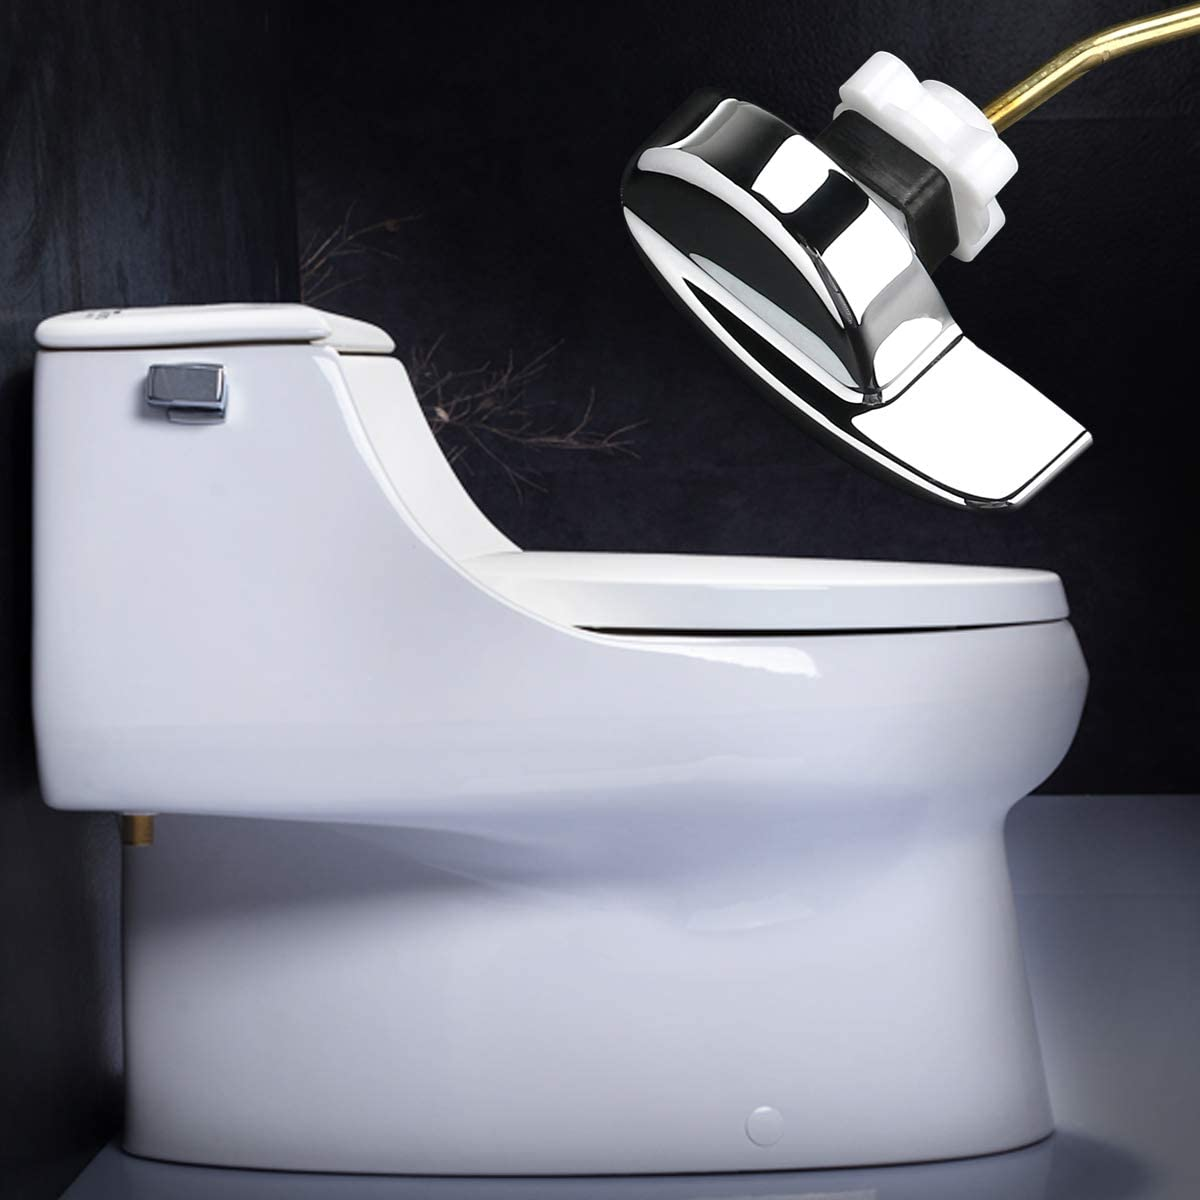 Angle Fitting Side Flush Tank Cistern Metal Lever Toilet Handle for TOTO Kohler